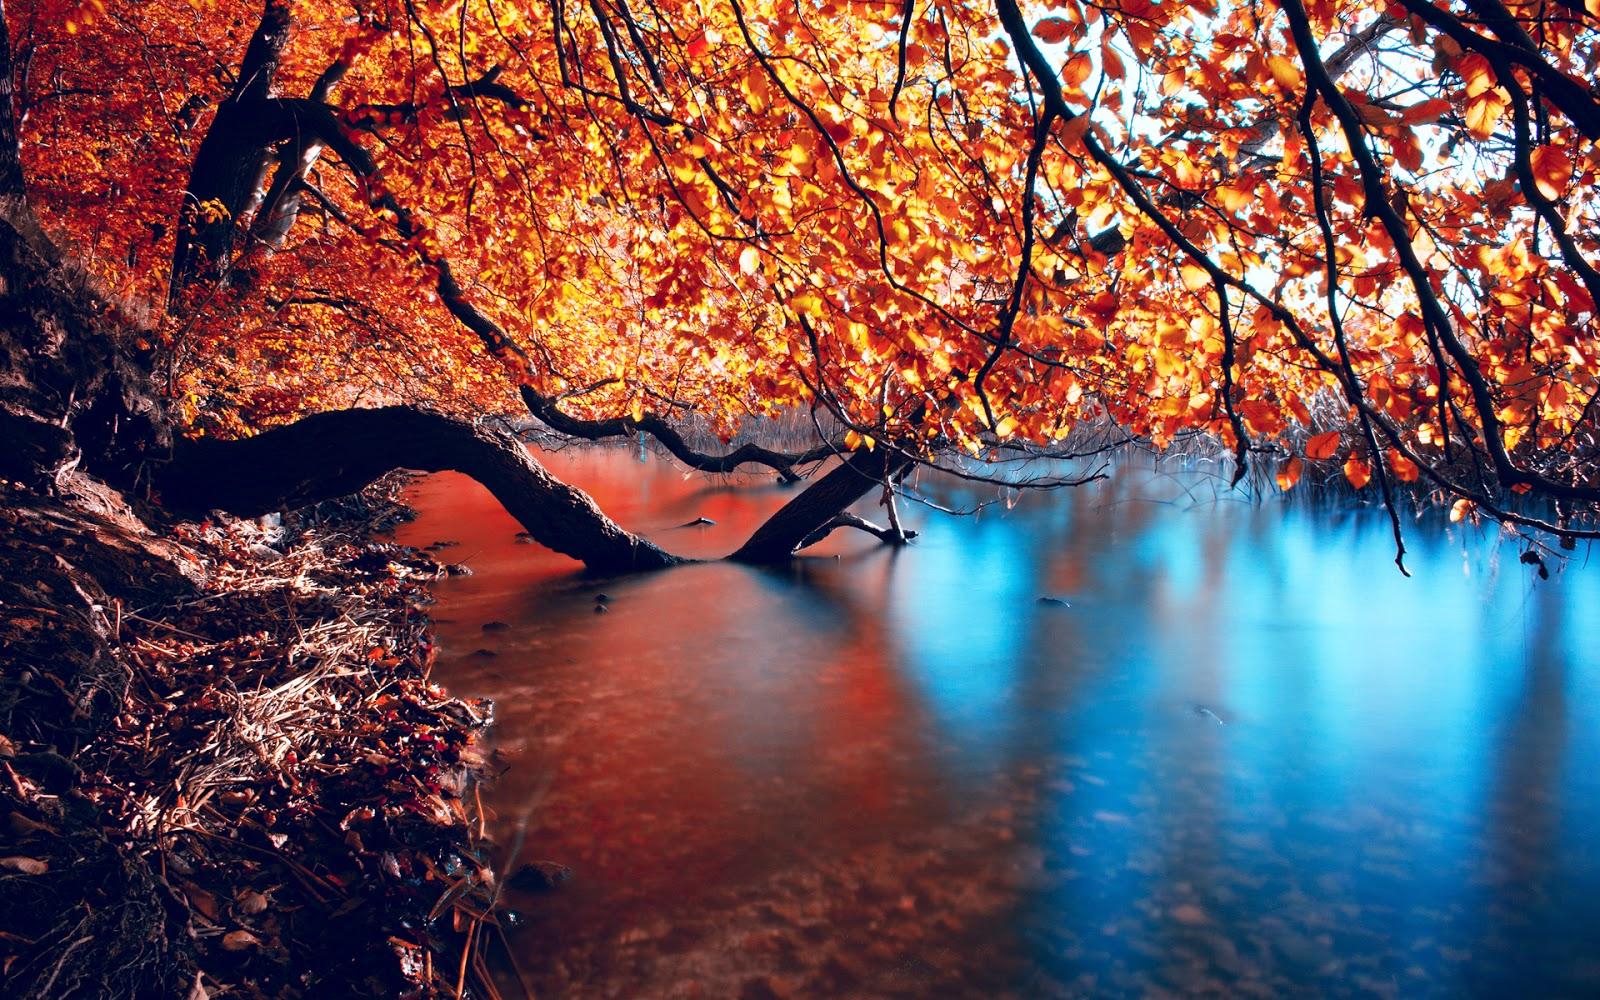 nature wallpaper 5 pt2 - photo #24